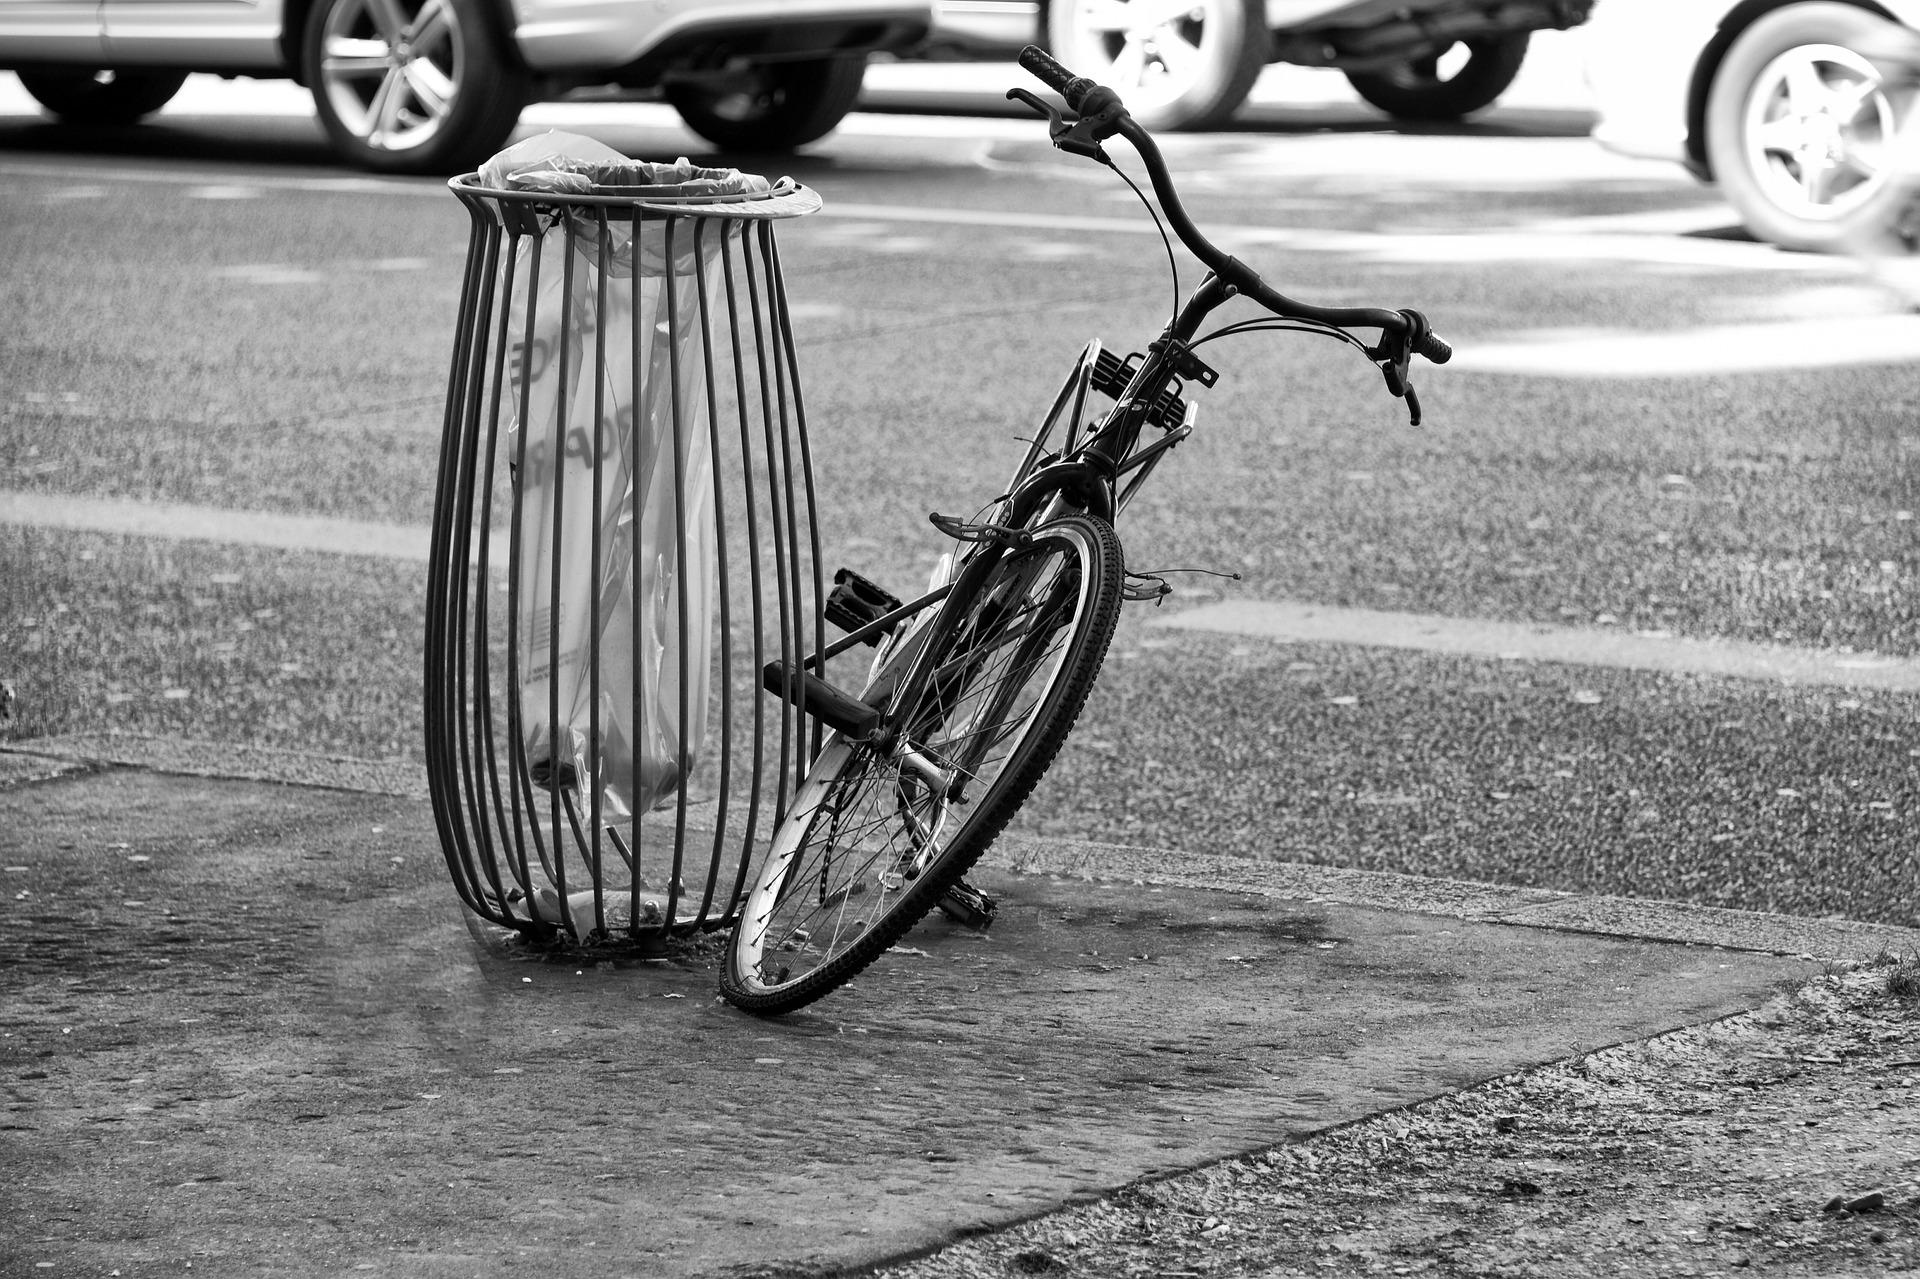 Bicikl. Foto: ddouk. Izvor: https://pixabay.com/p-986633/?no_redirect